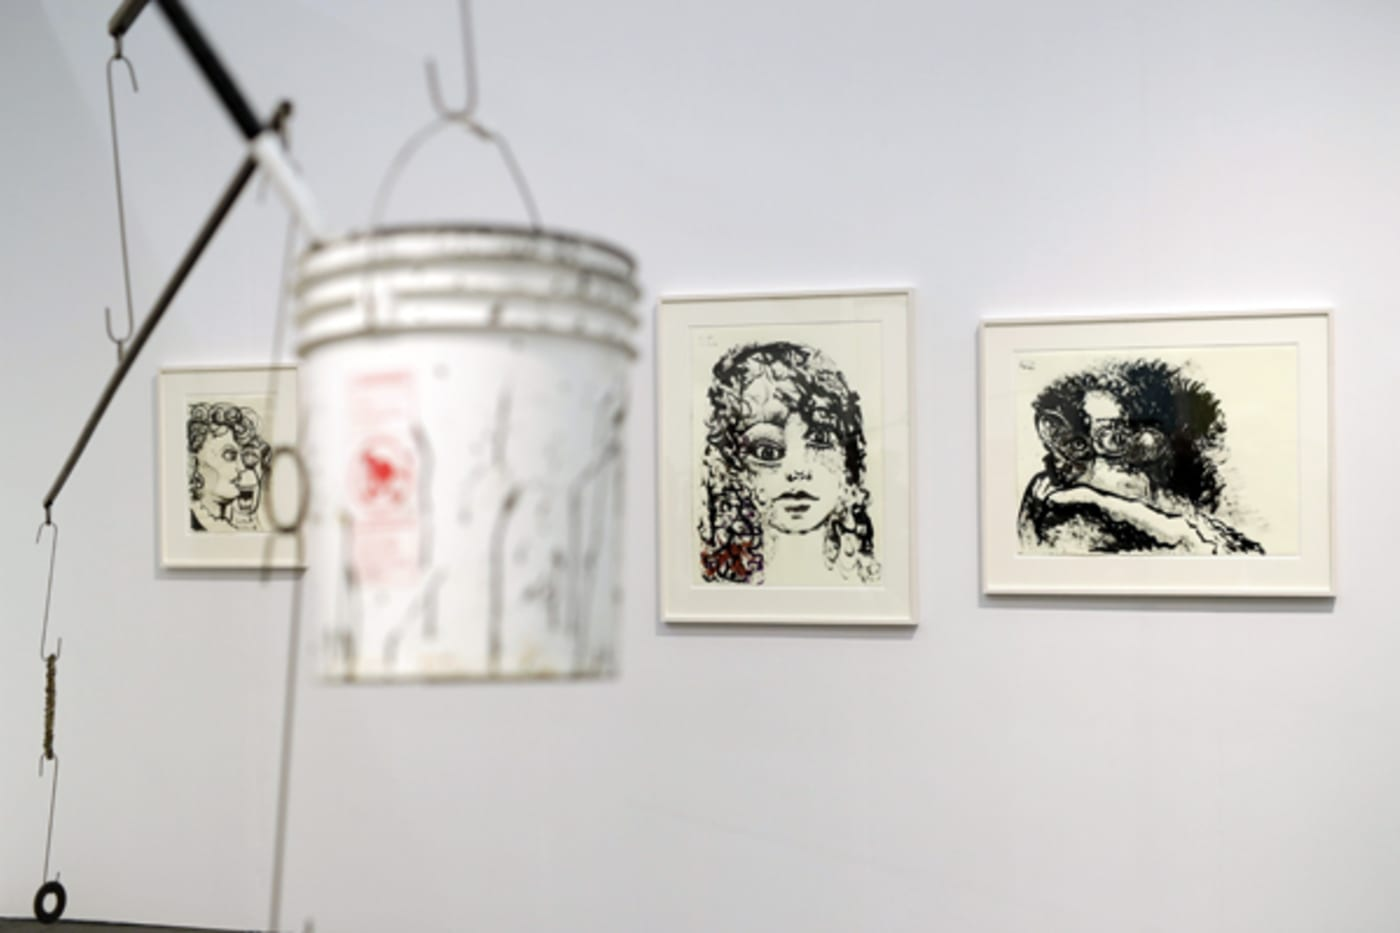 best art galleries sprueth magers gallery